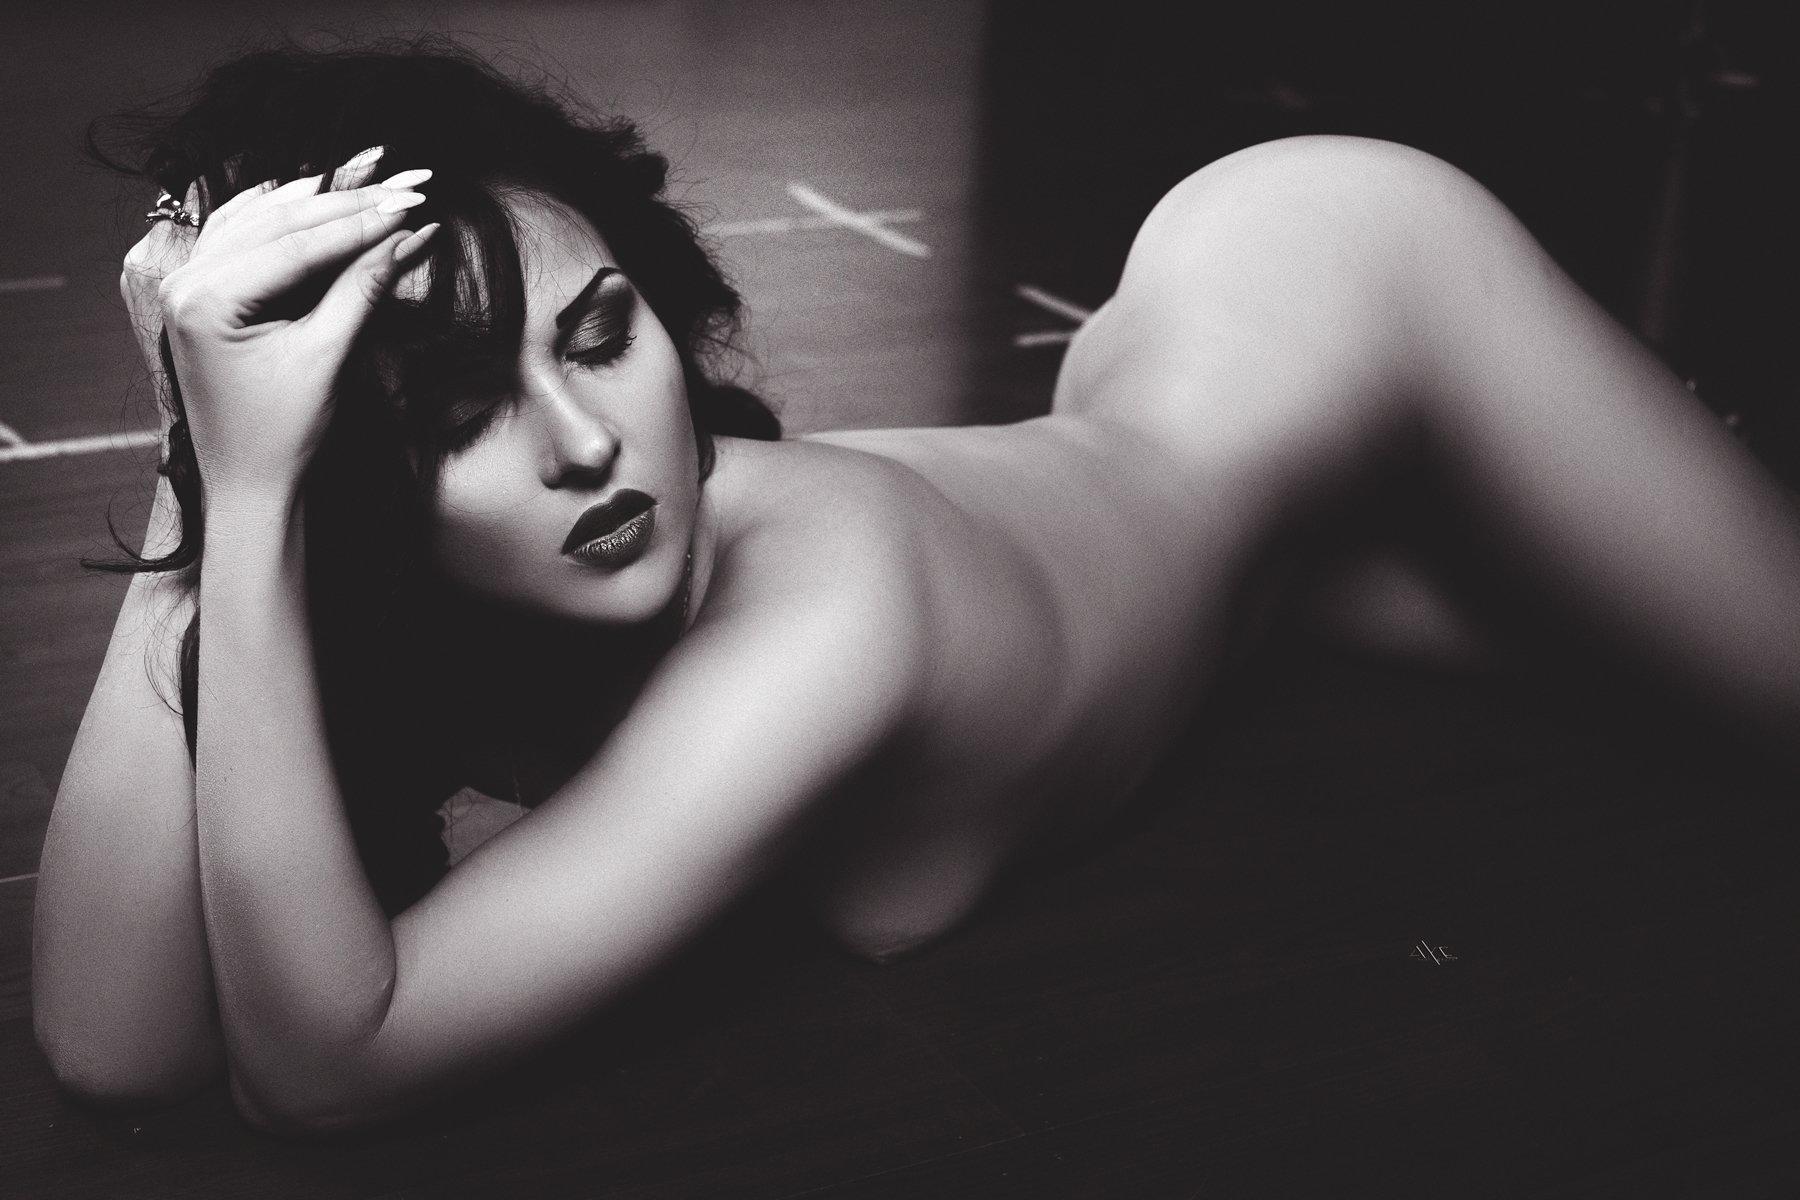 woman, nude, portrait, Руслан Болгов (Axe)